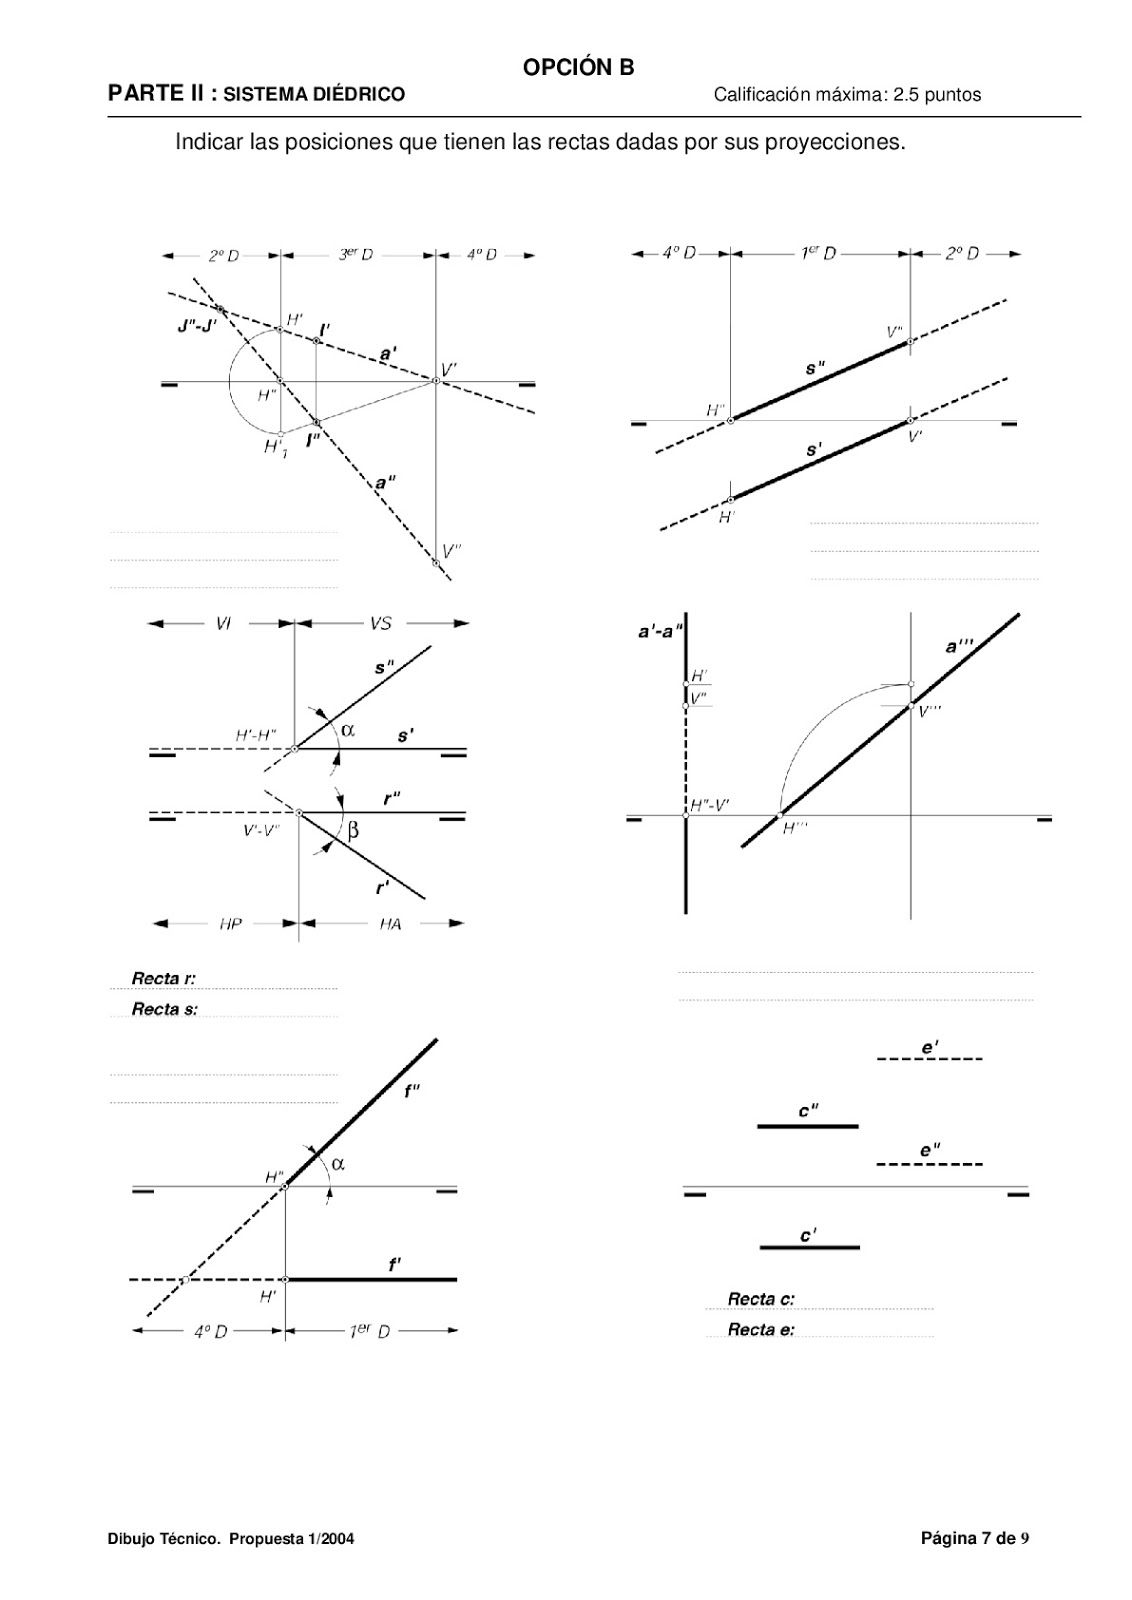 Examenes De Evaluacion Bachillerato Dibujo Tecnico Para El Acceso A La Universidad Ebau 2018 Co Dibujo Tecnico Bachillerato Bachillerato Tecnicas De Dibujo